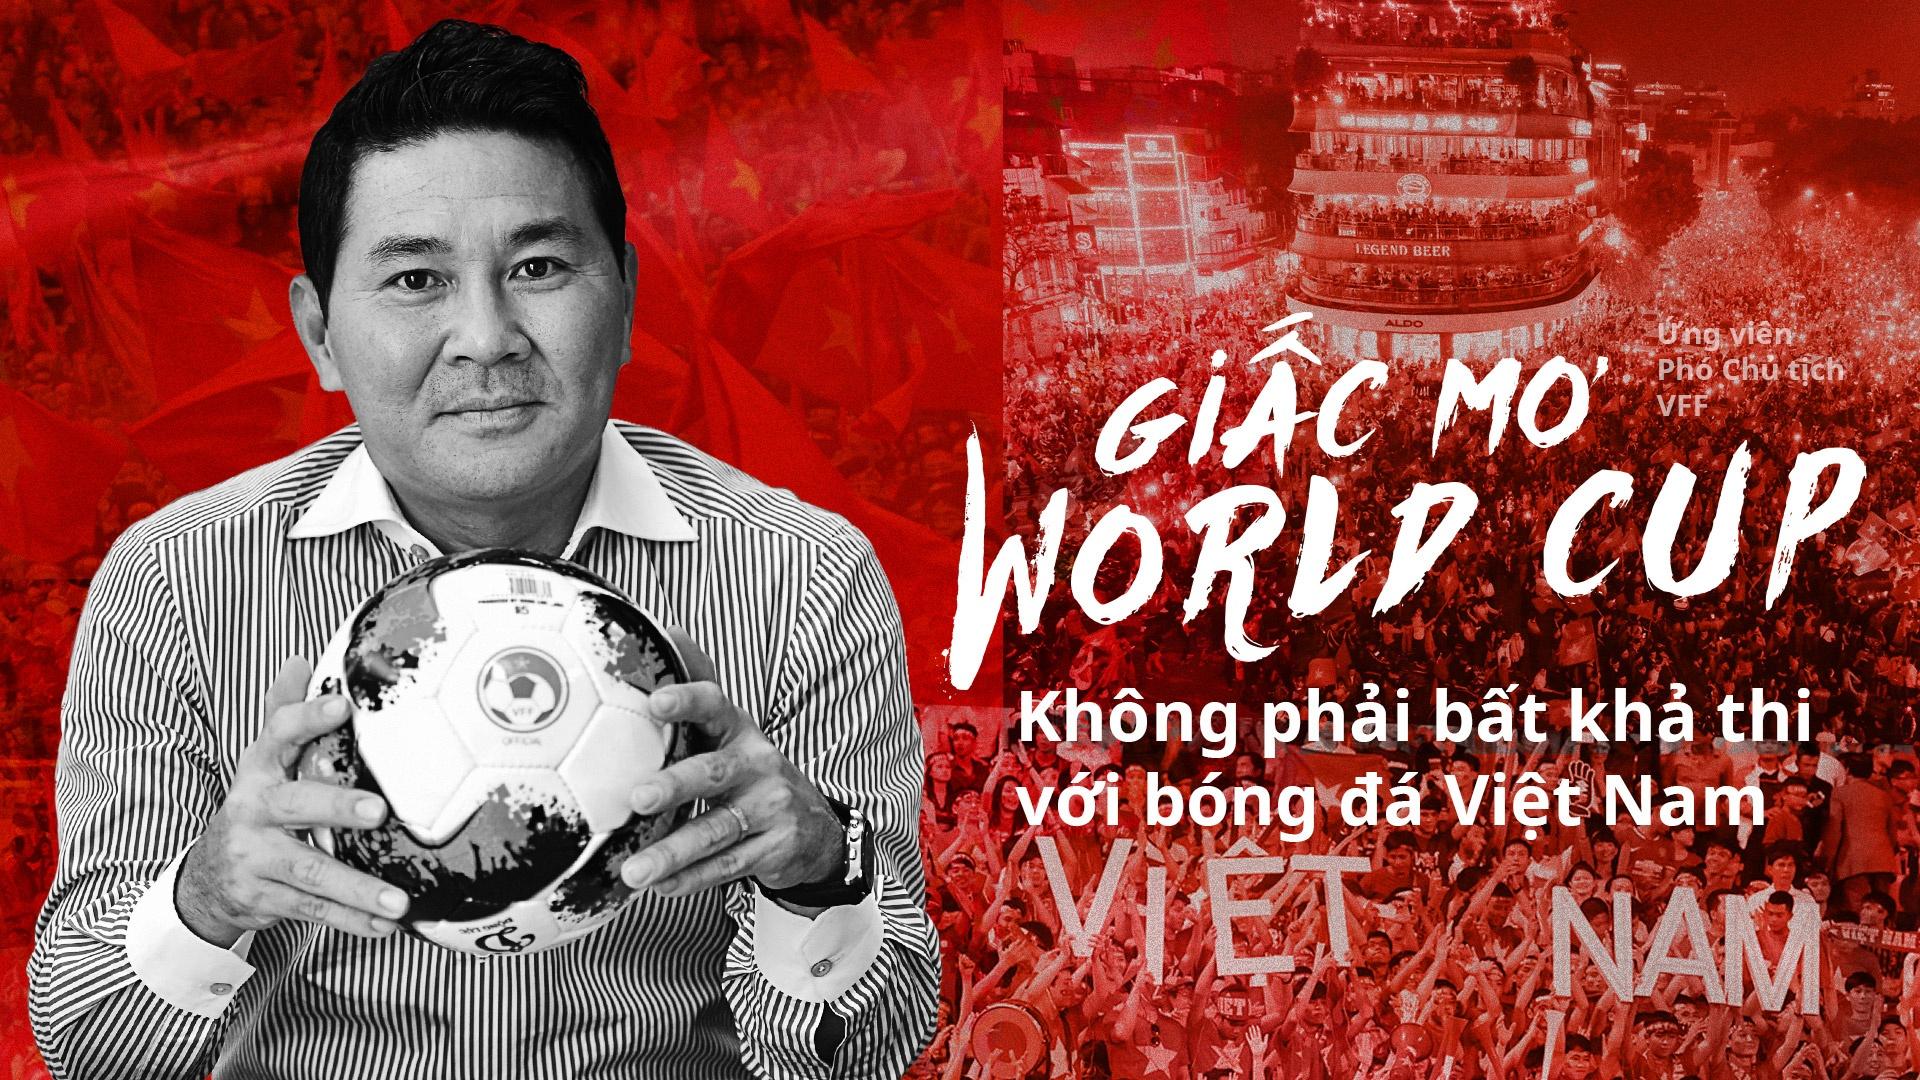 Ung vien Pho Chu tich VFF: Giac mo World Cup khong bat kha thi voi VN hinh anh 2